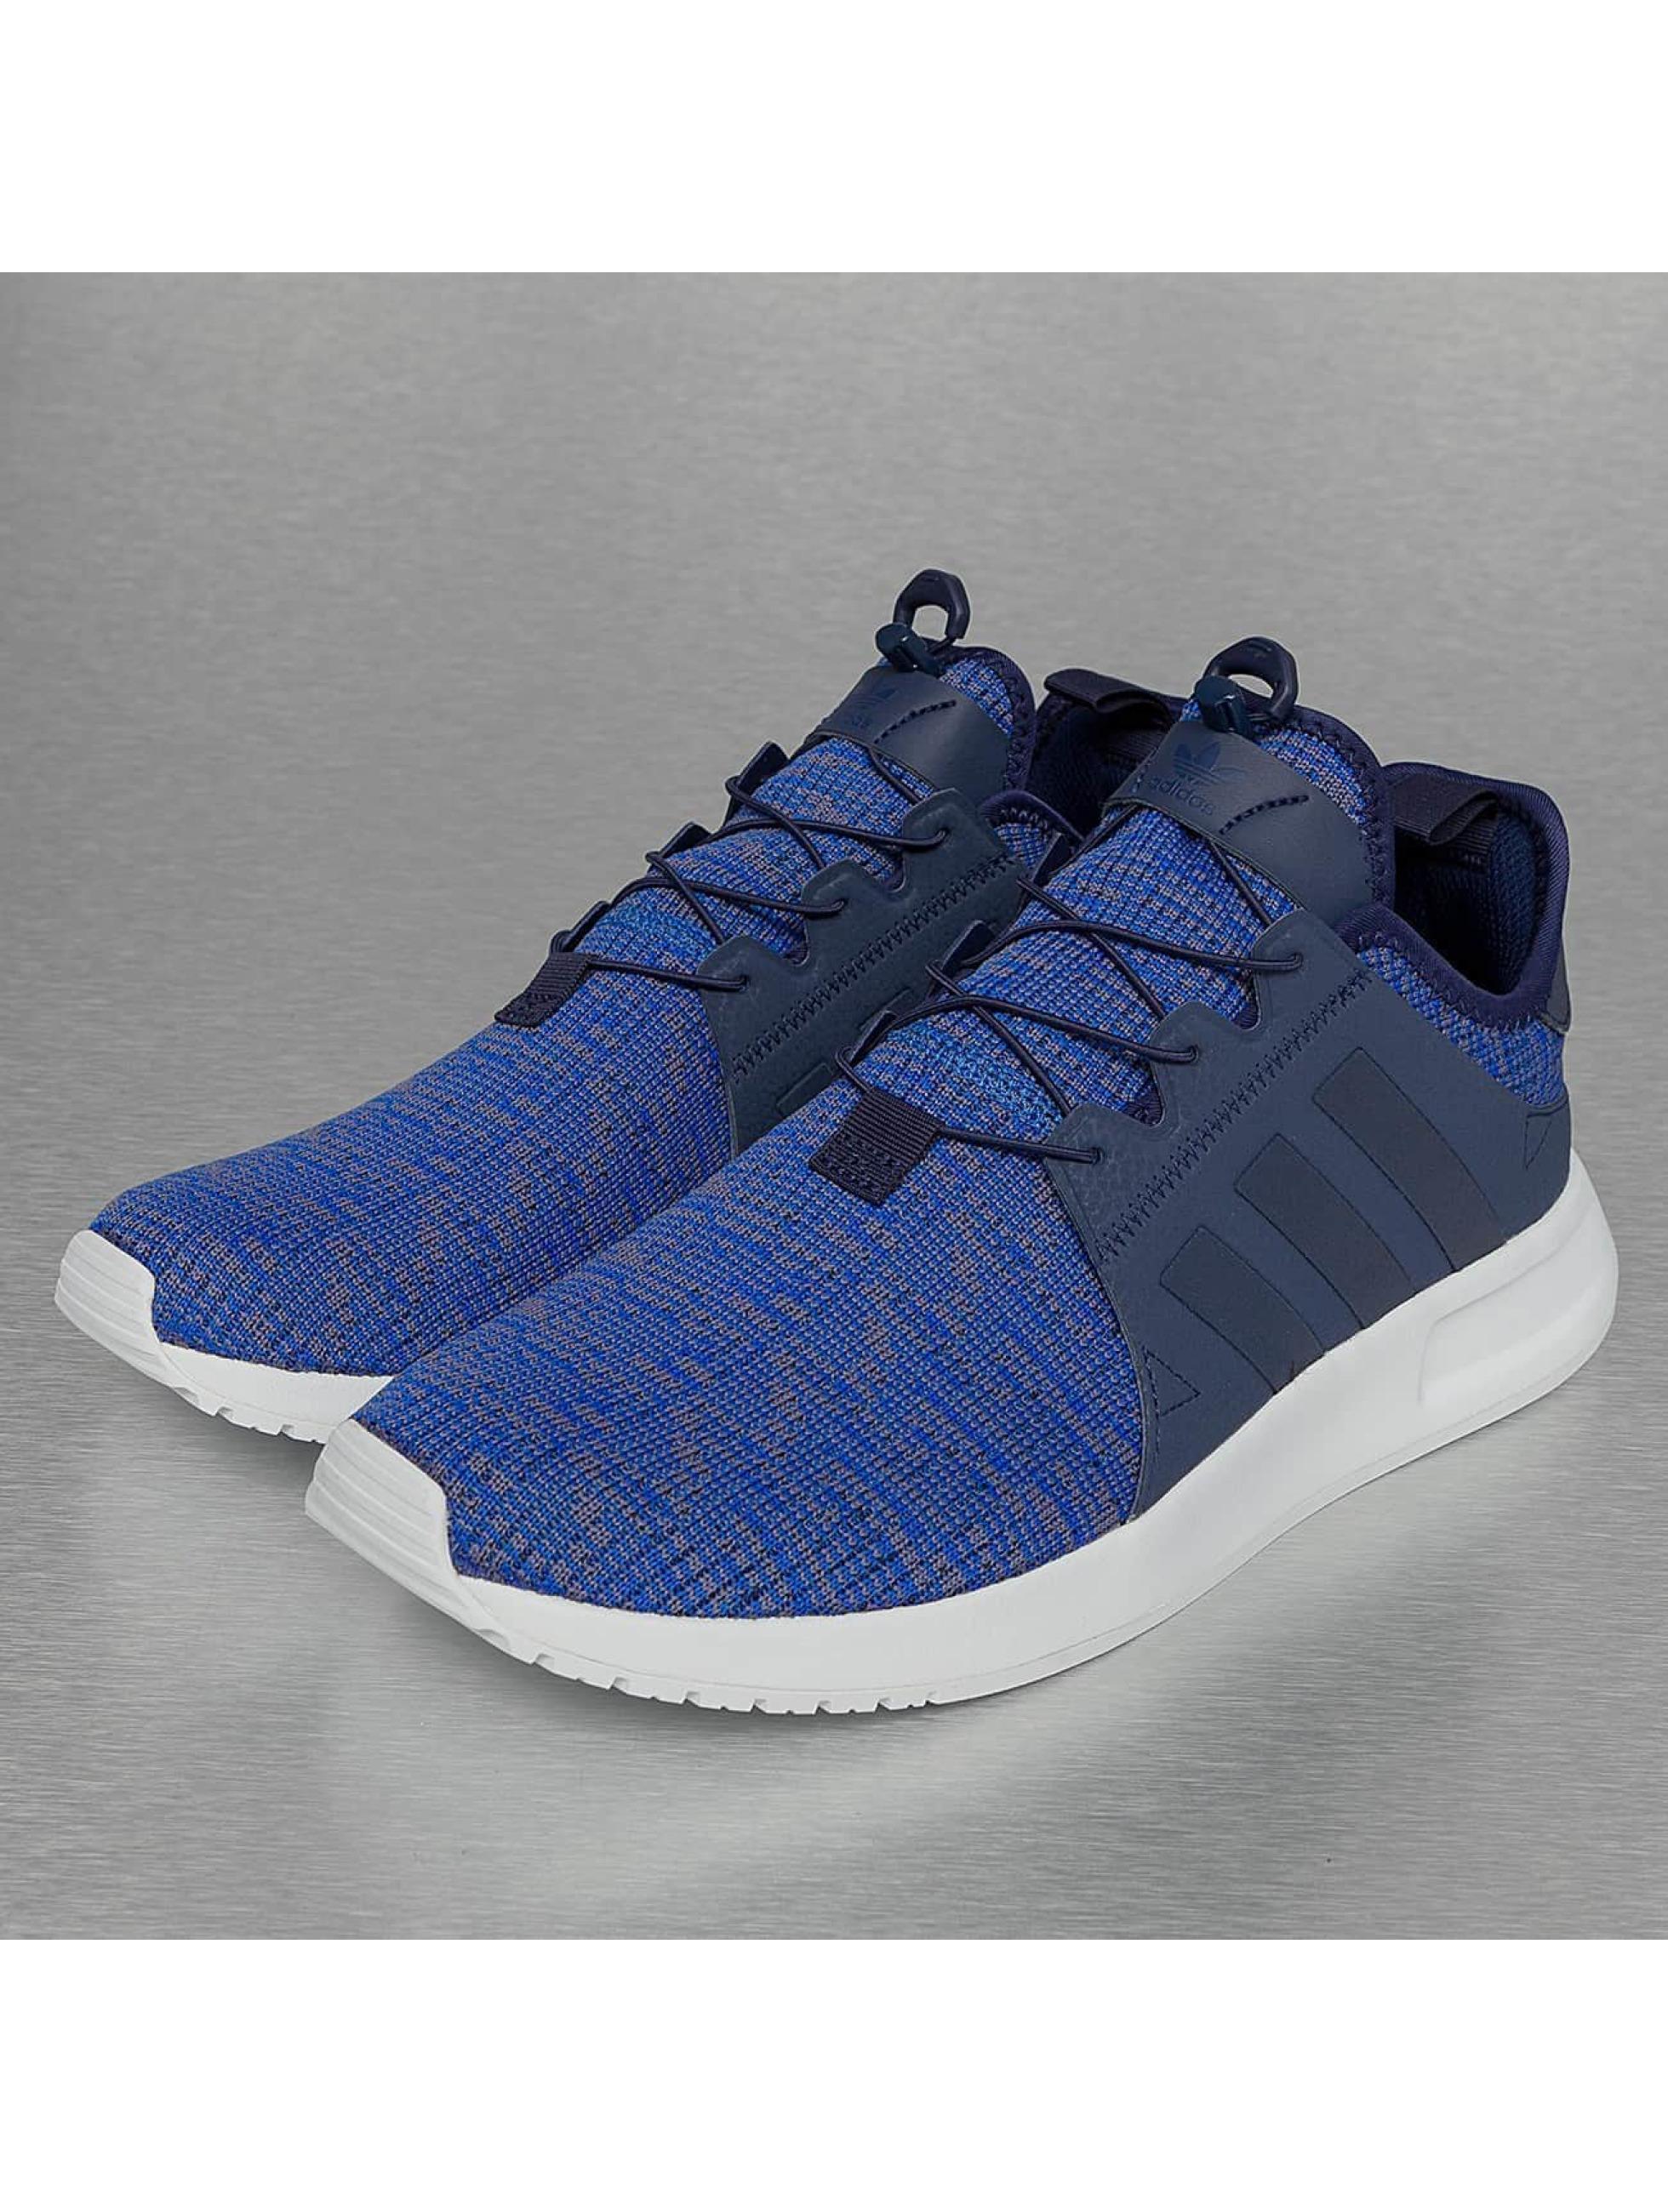 Adidas X_PLR Sneakers Dark Blue/Dark Blue/Ftwr White